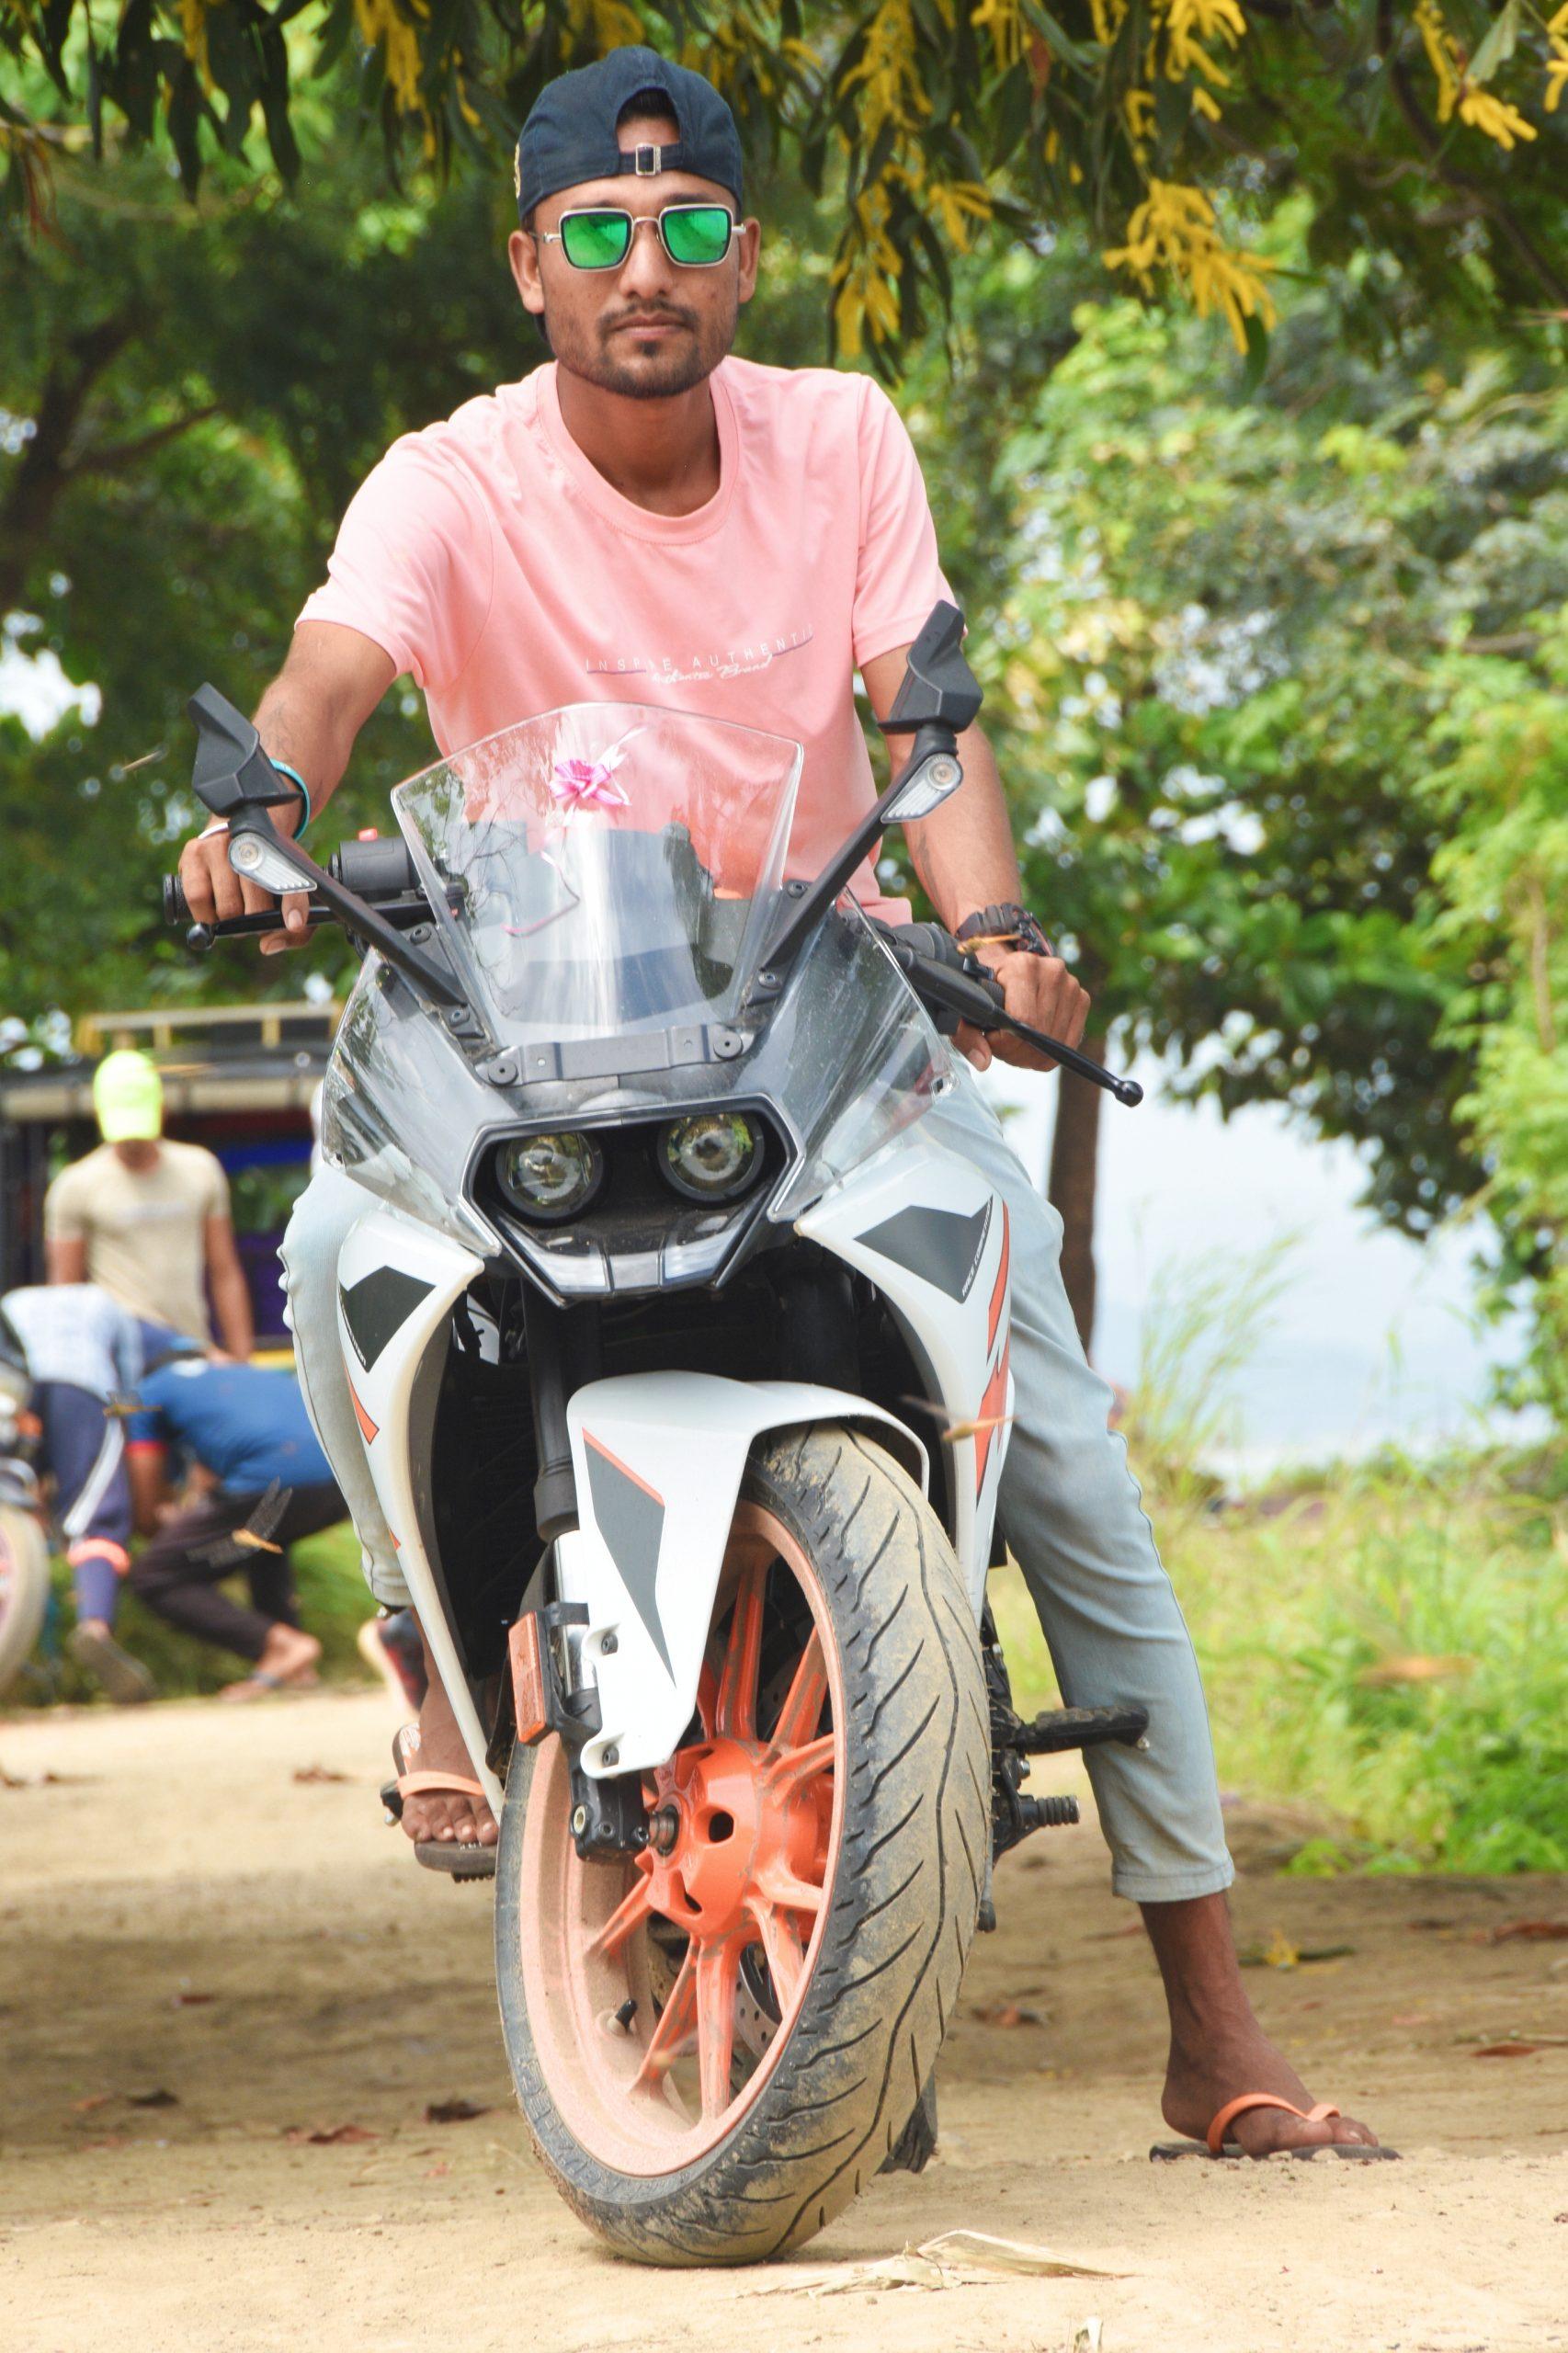 A bike rider